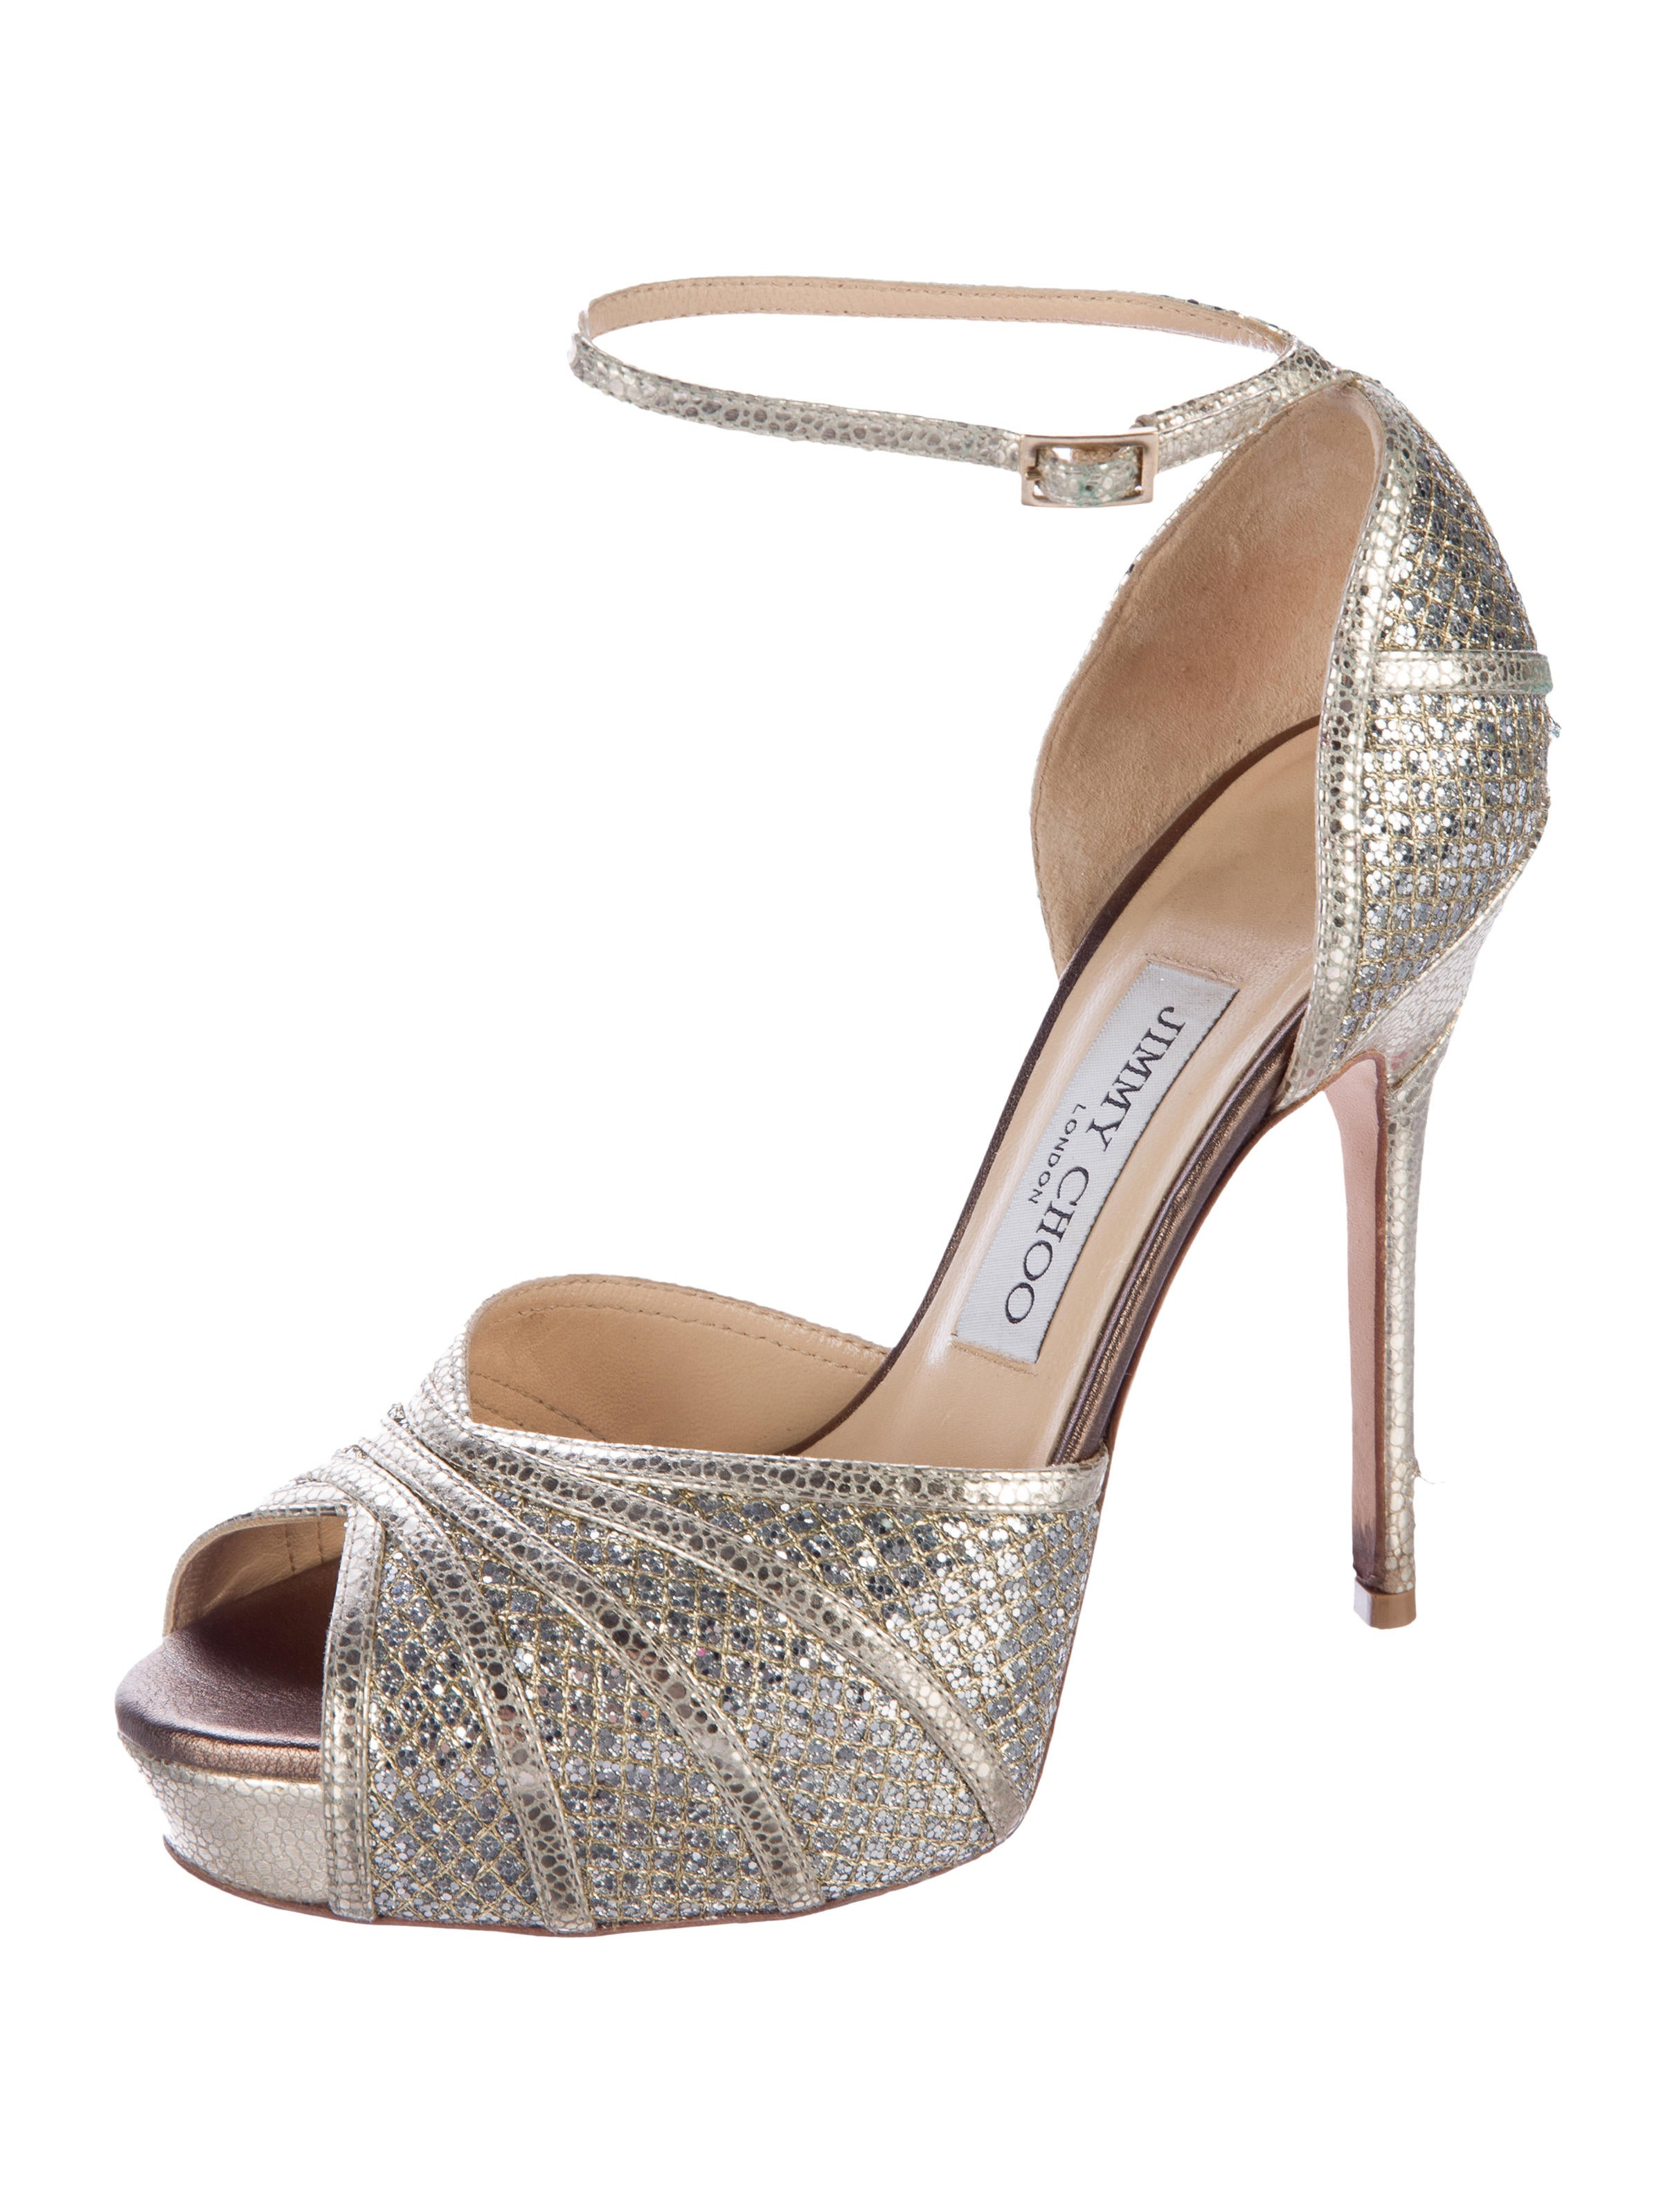 76b15687c160cf Jimmy Choo Kafta Glitter Pumps - Shoes - JIM59024